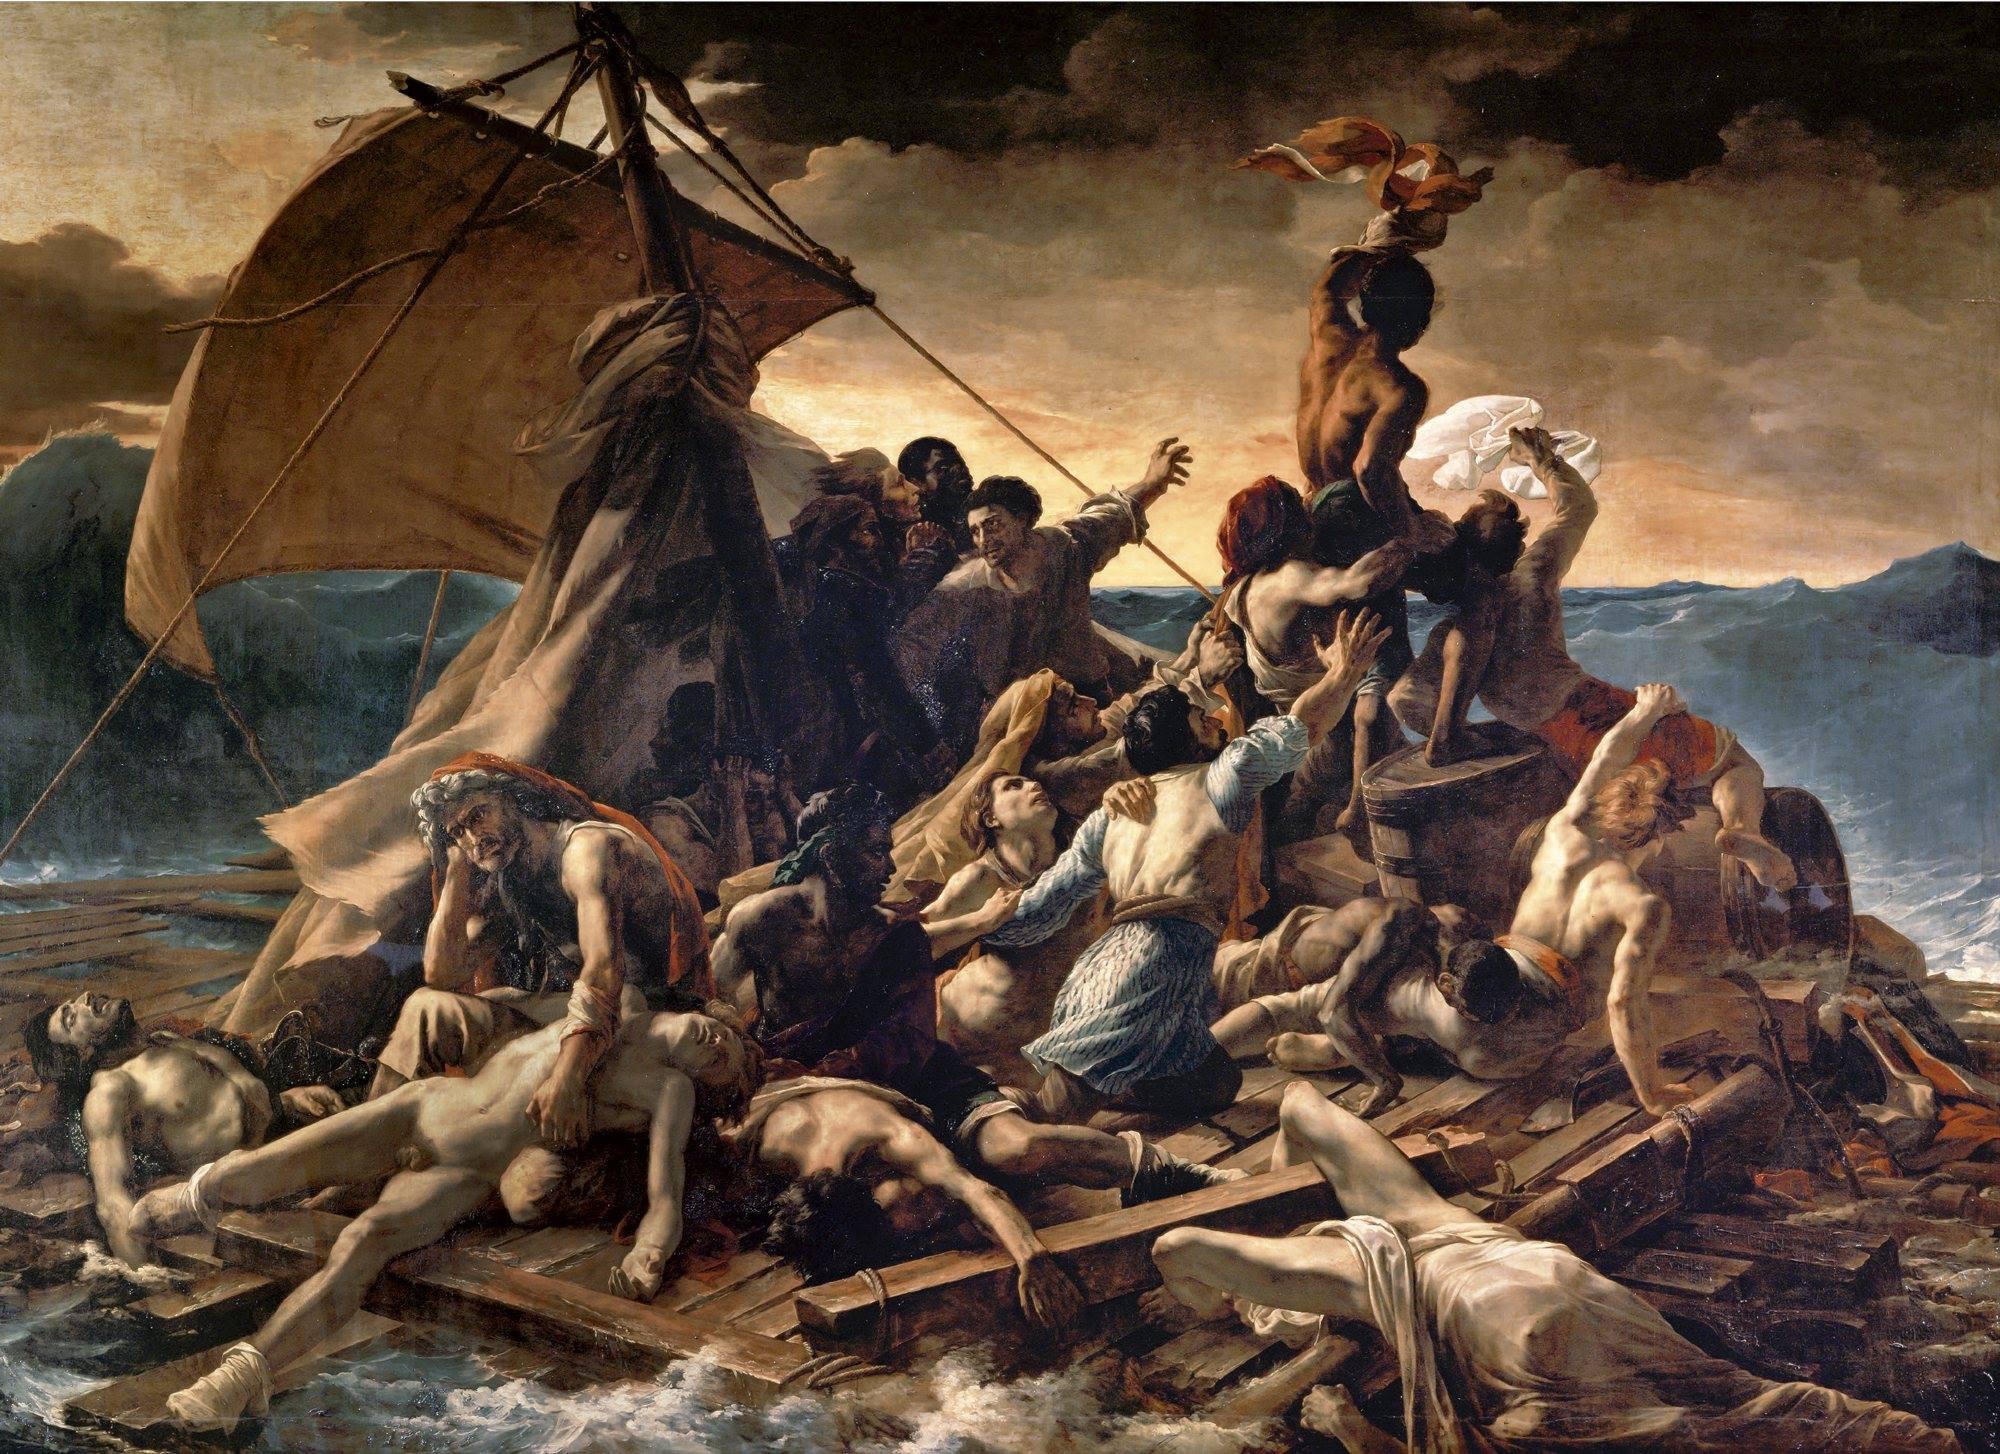 La balsa de la Medusa  (1819),Théodore Géricault